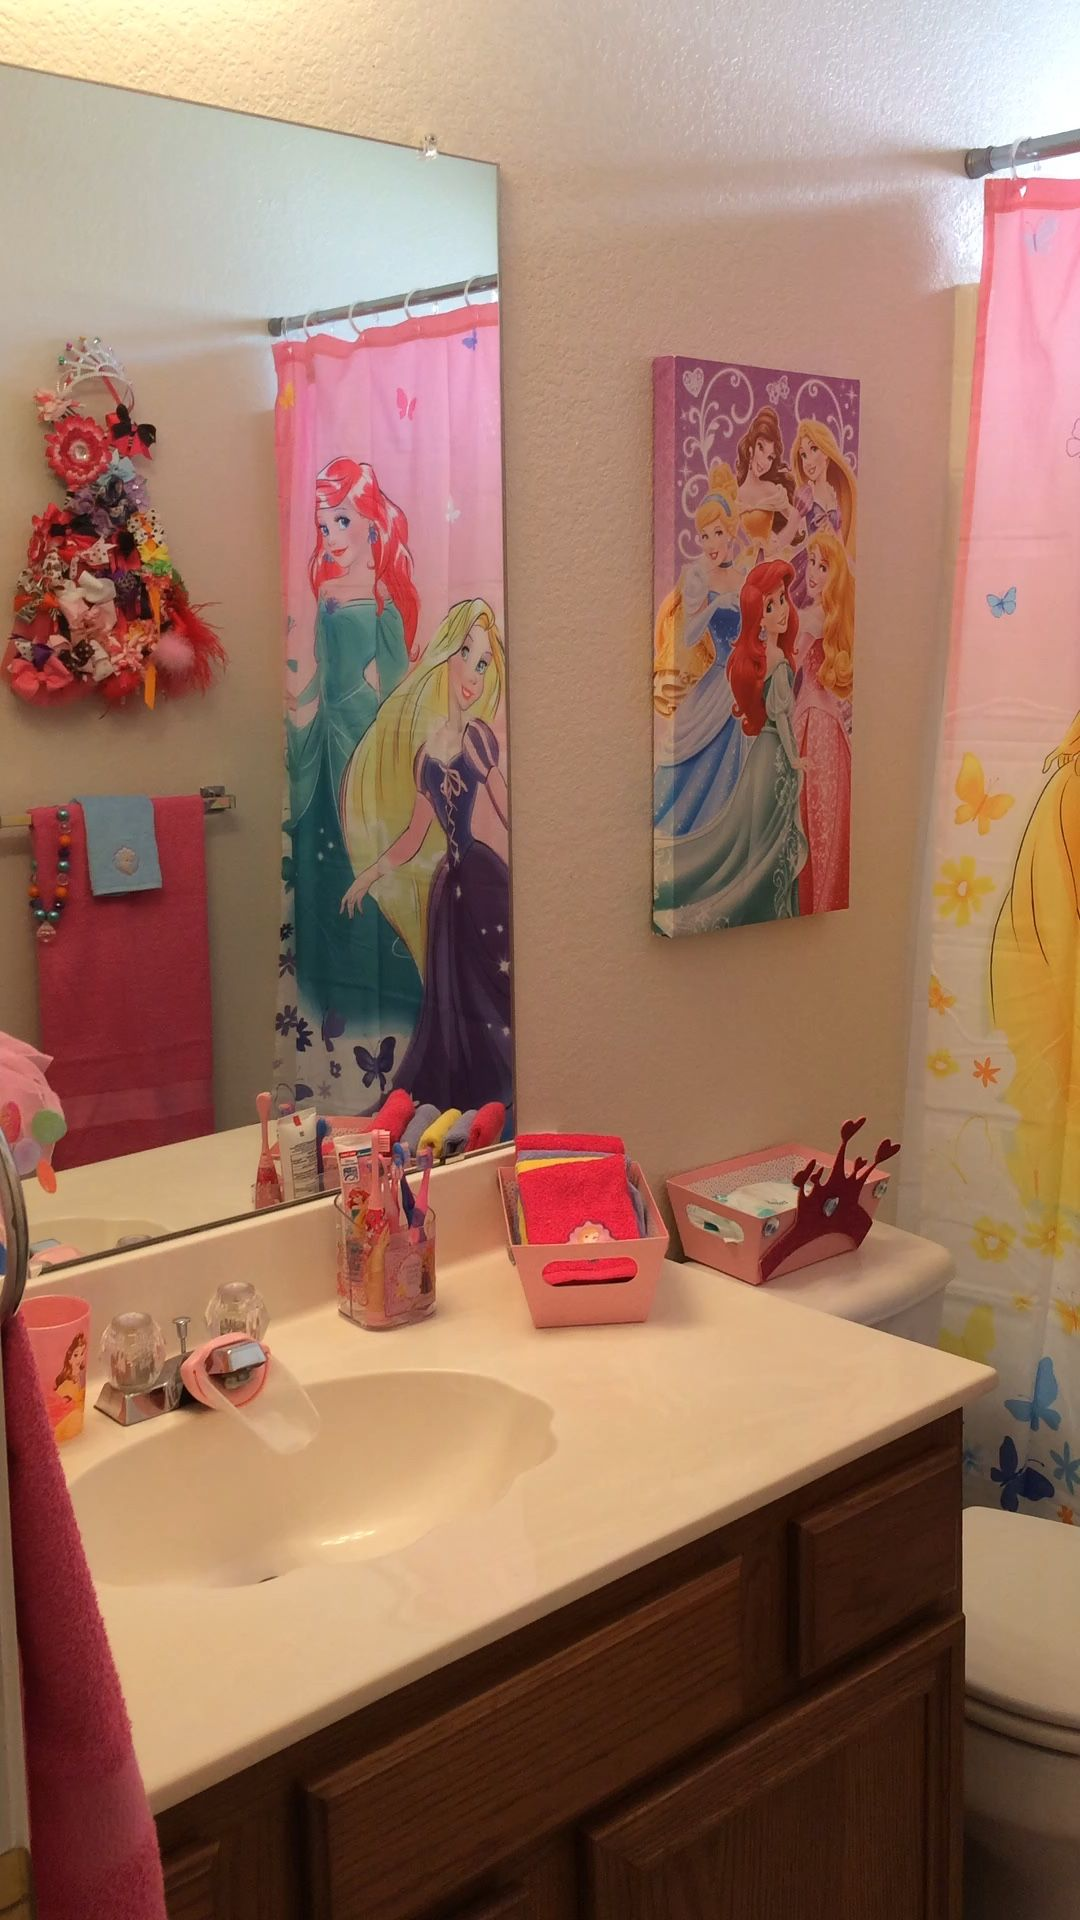 Little Girl Bathroom Decor.Pin By Pala Martinez Restrepo On Cuarto Ninas In 2019 Girl